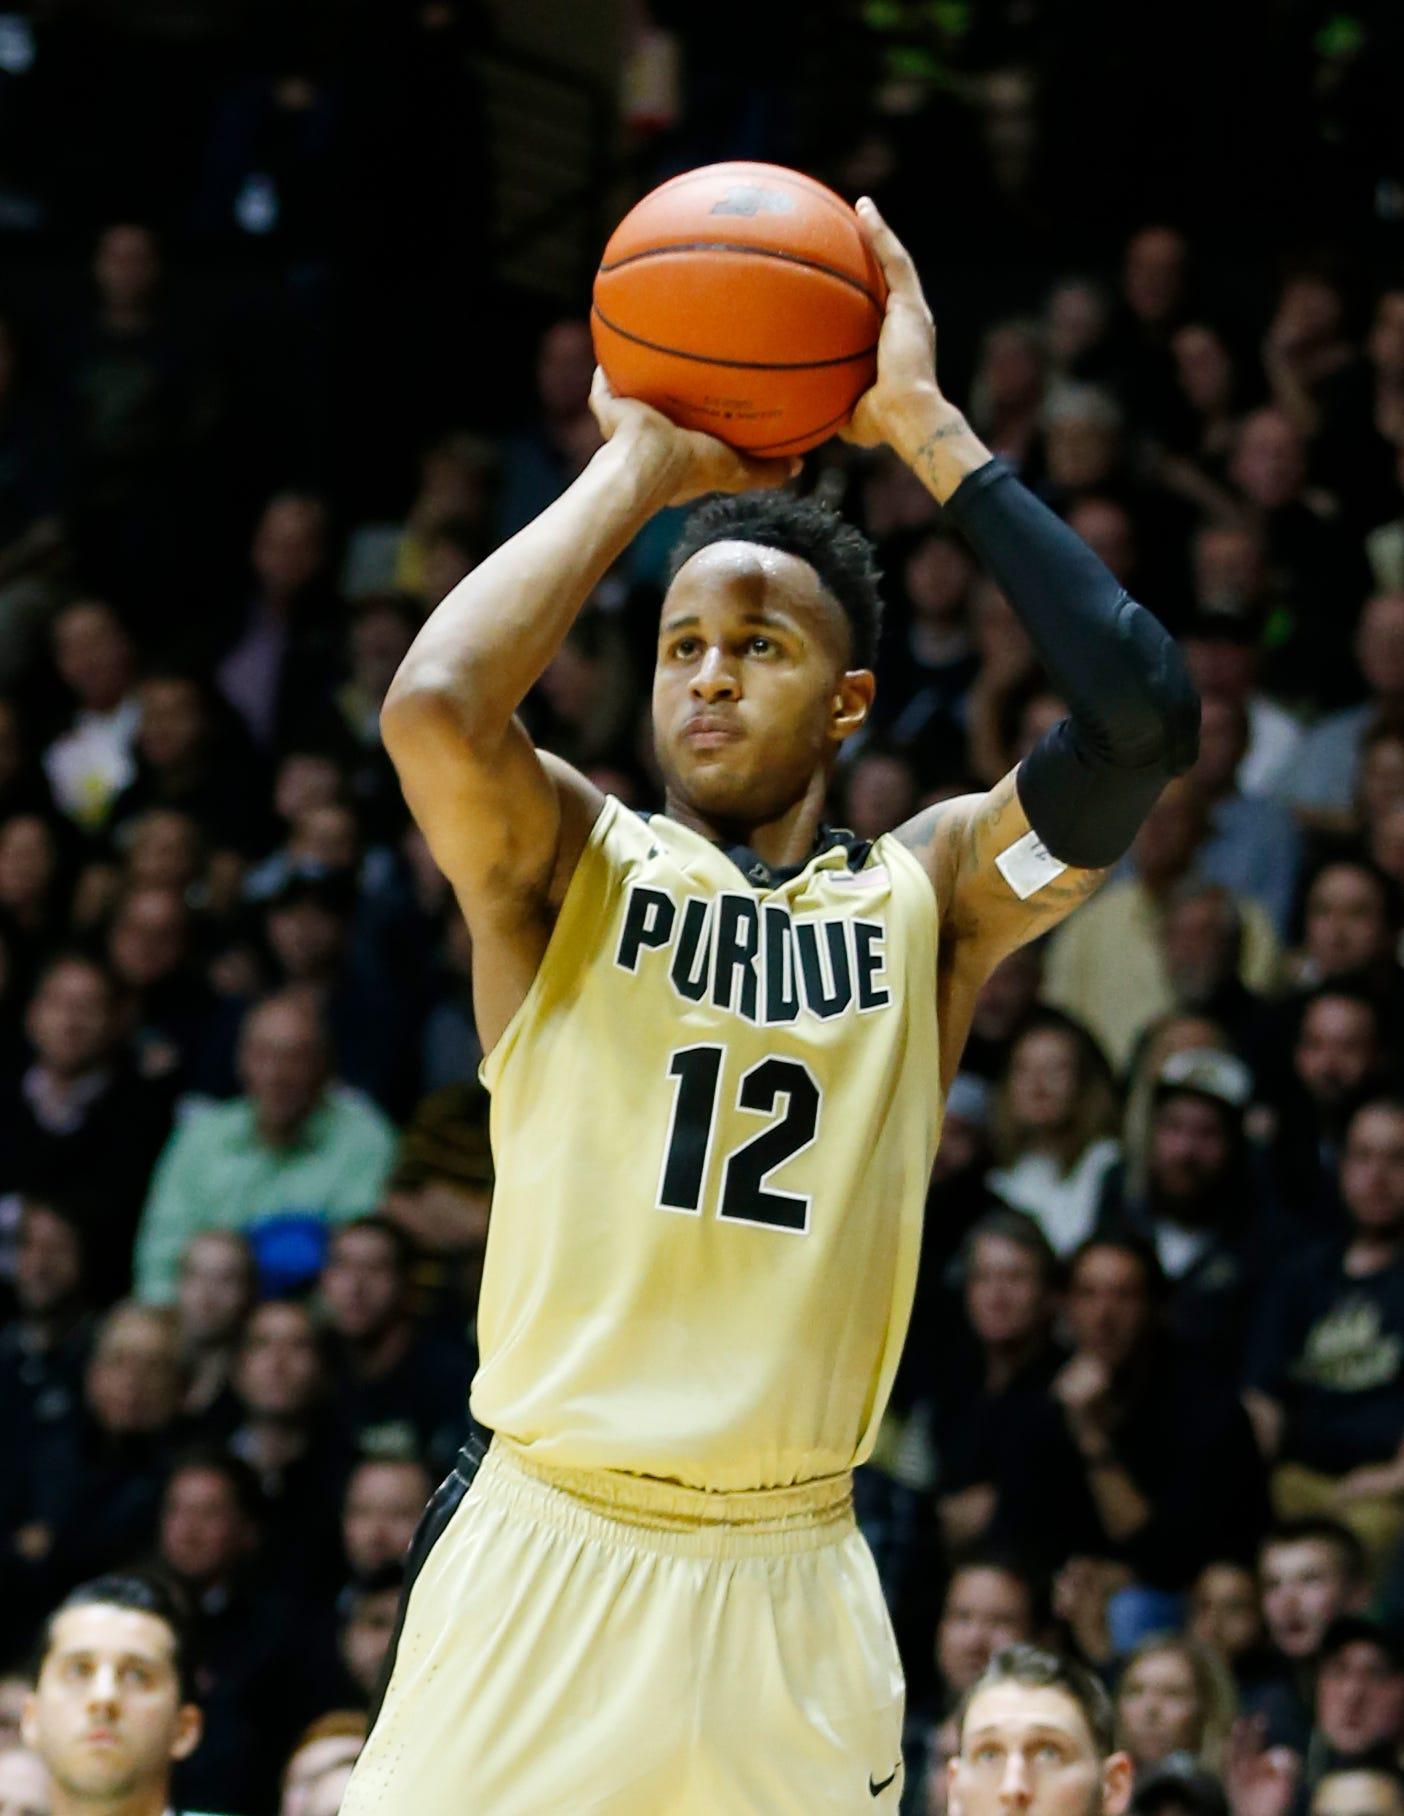 Purdue's Vincent Edwards returning for senior year